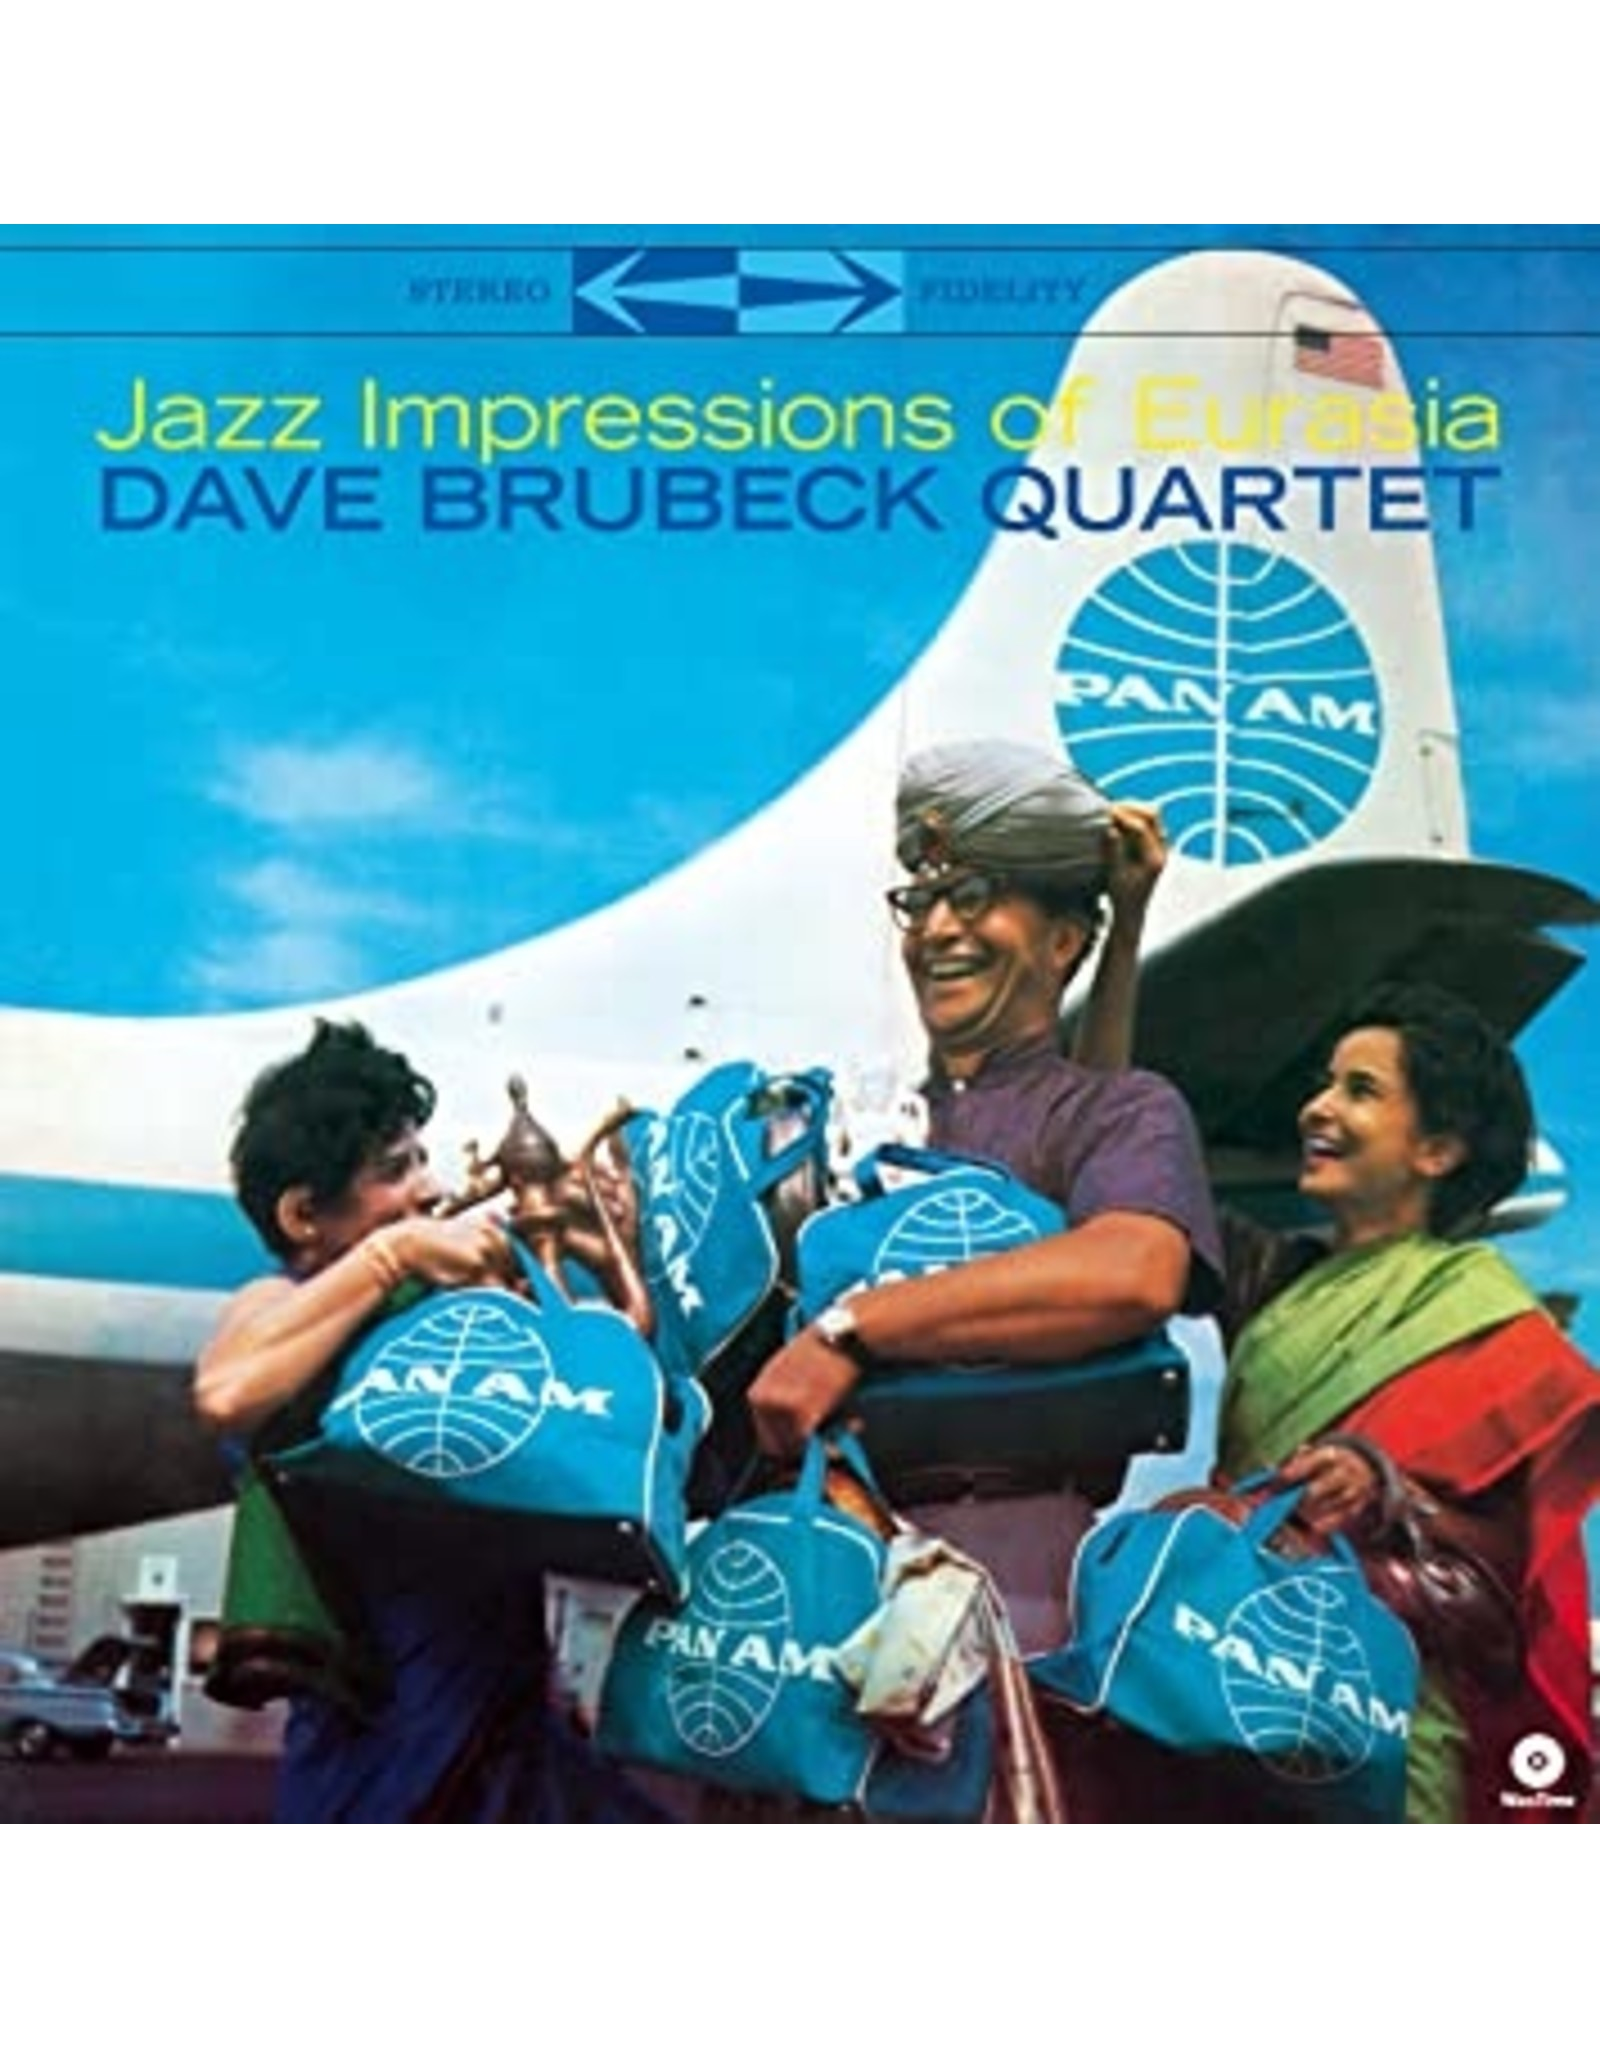 New Vinyl Dave Brubeck - Jazz Impressions Of Eurasia LP